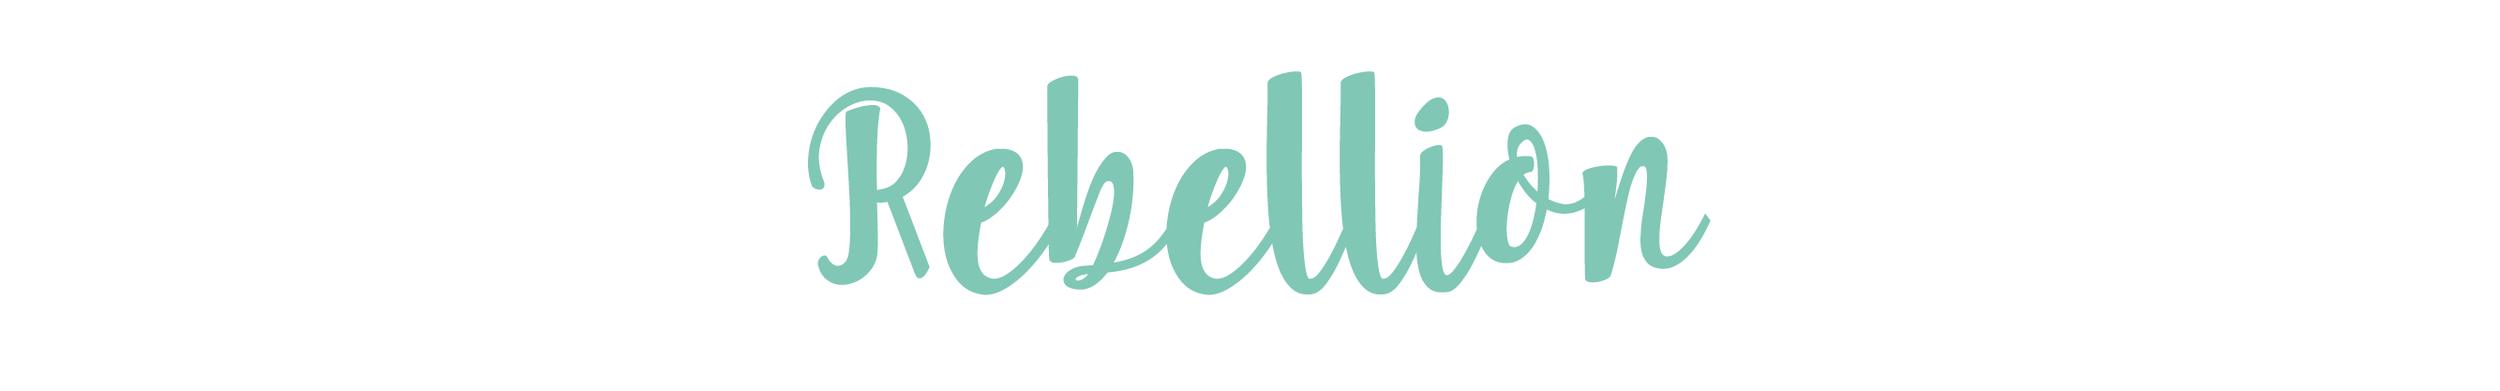 lhrebellion-01[4040].png